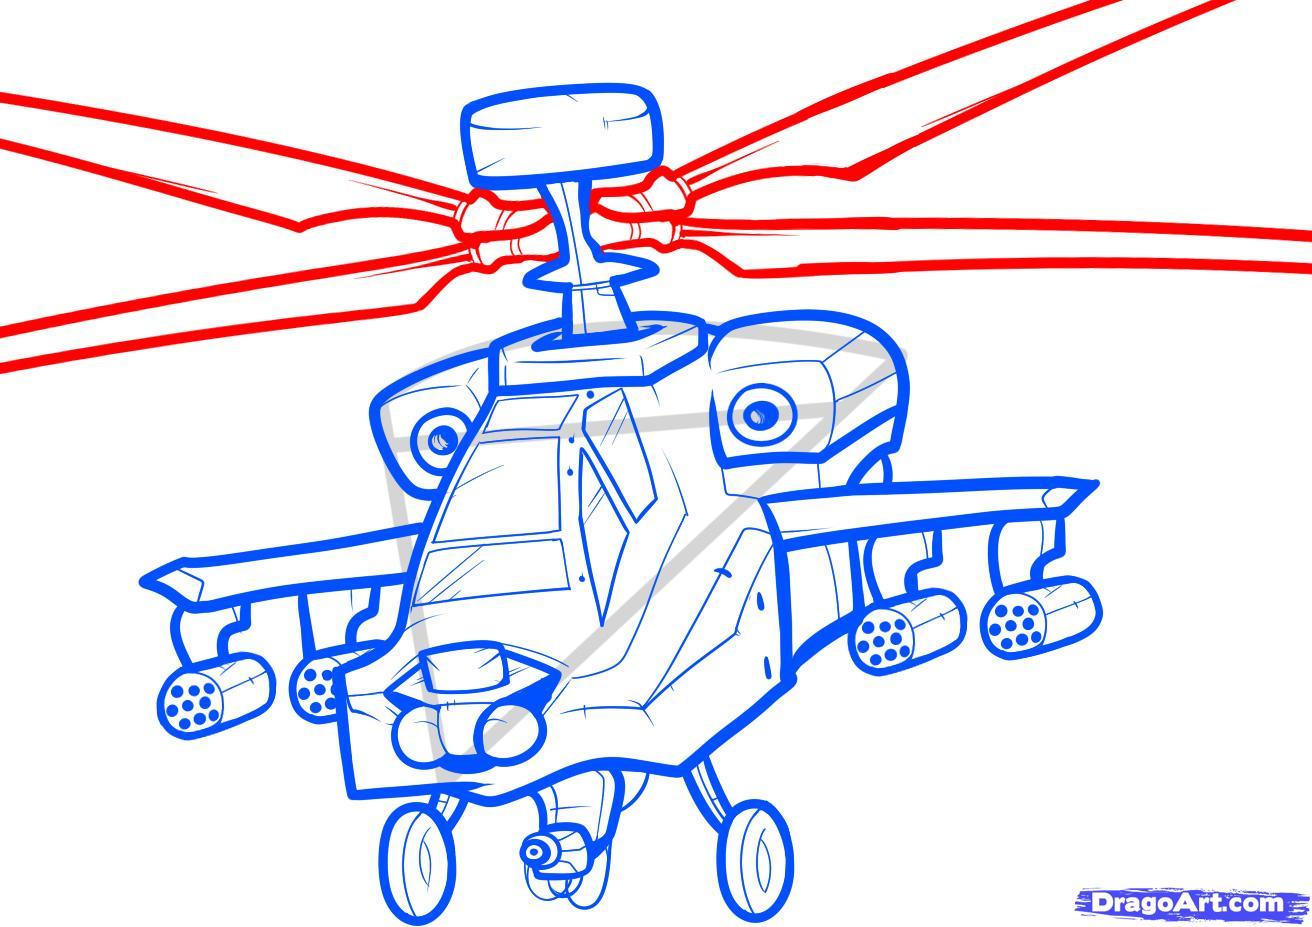 Рисуем вертолет AH-64 Apache - шаг 7